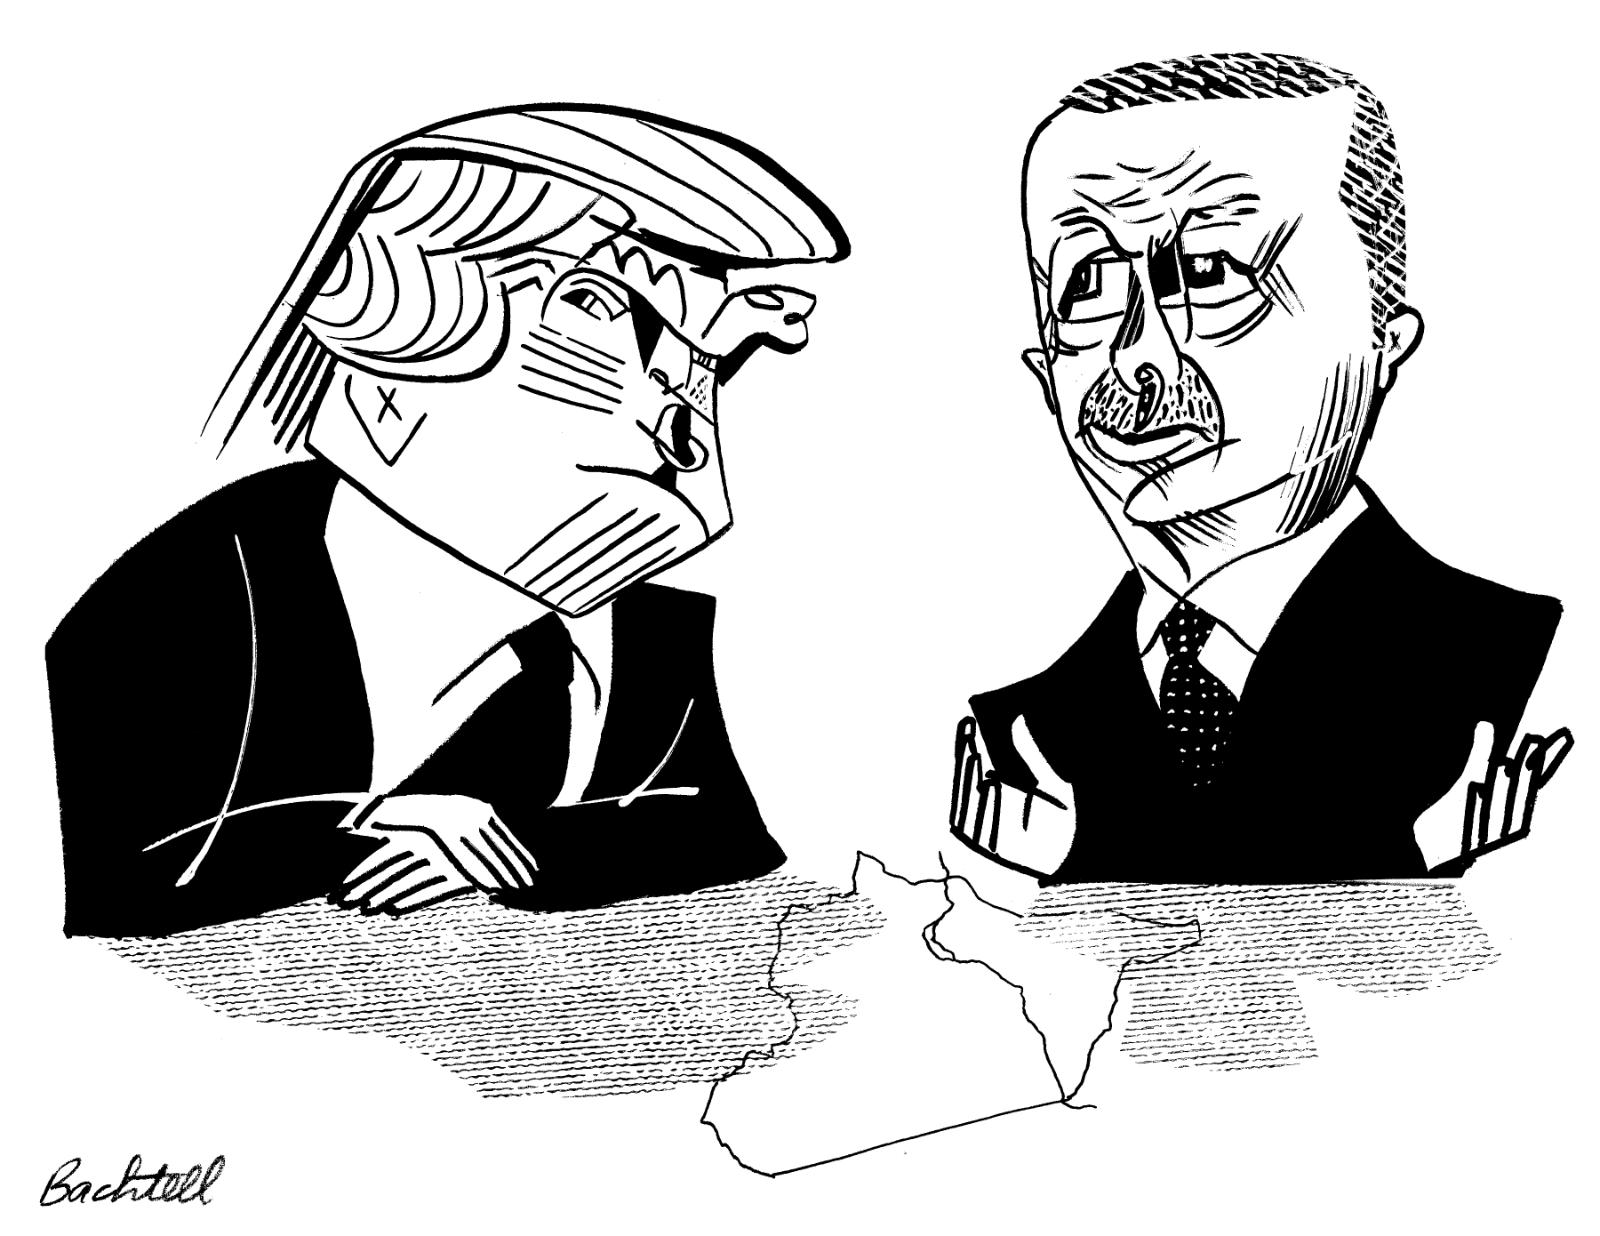 Donald Trump and Recep Tayyip Erdoğan; drawing by Tom Bachtell